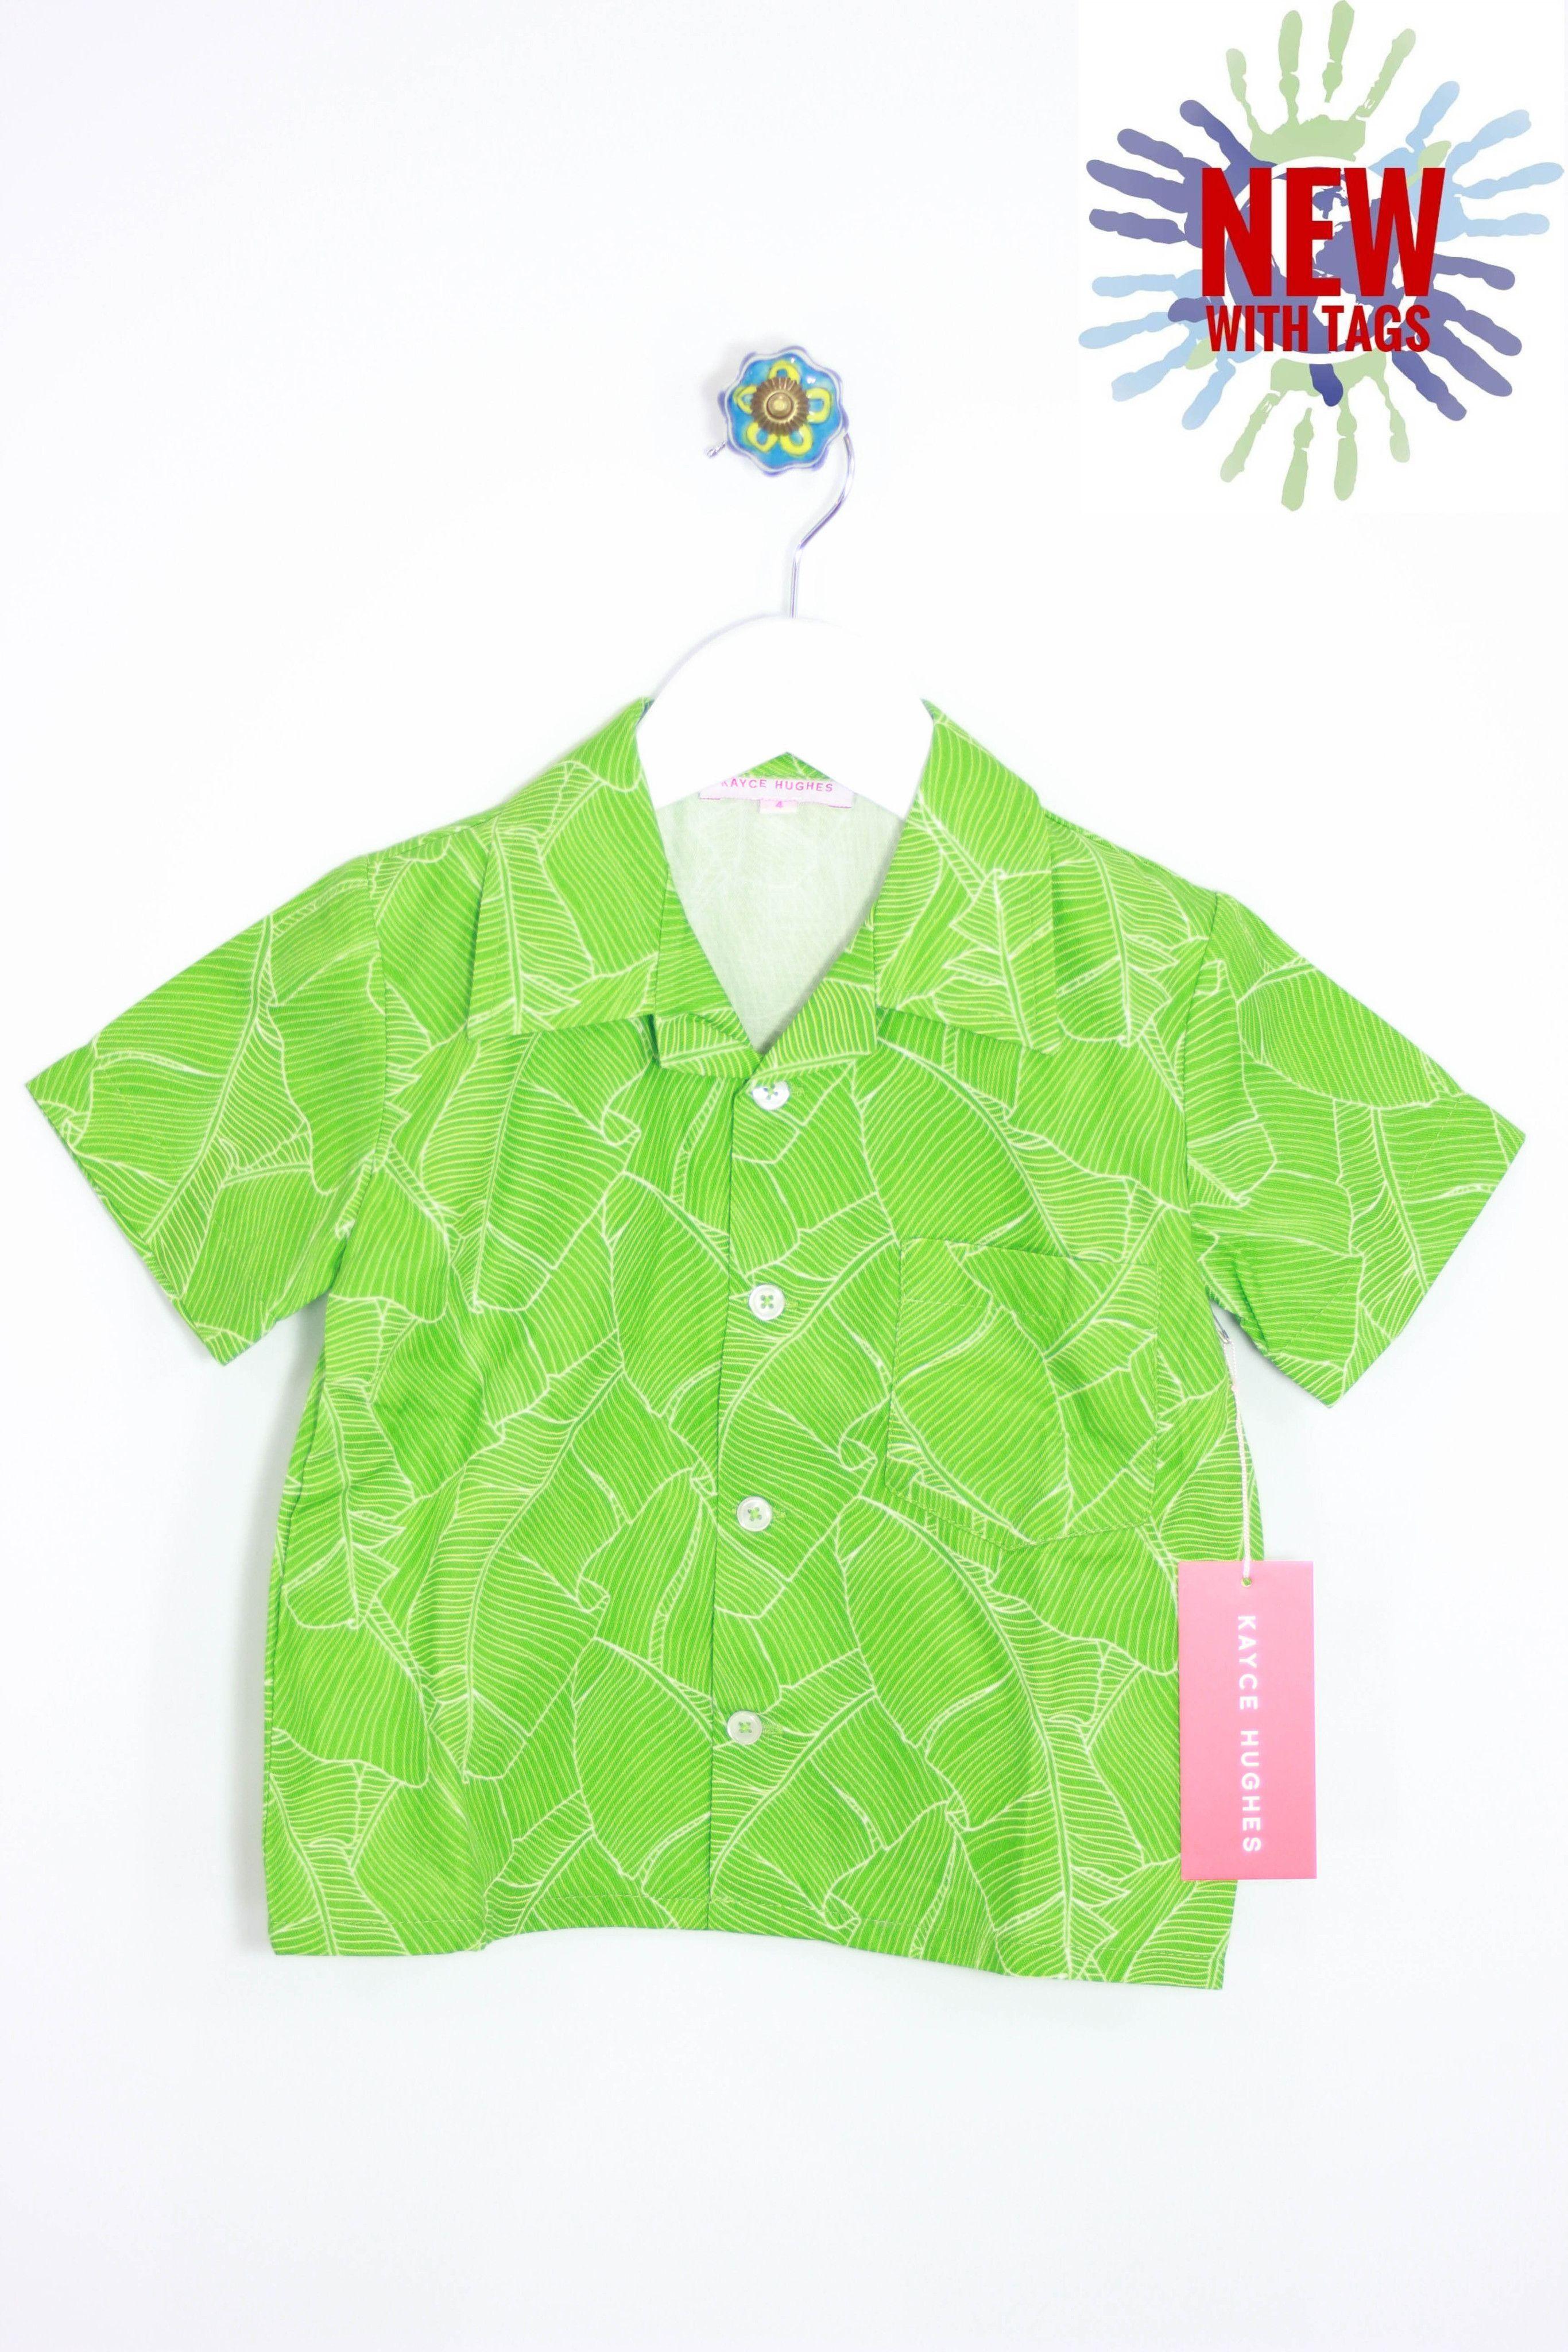 Kayce Hughes Size 5 Tropical Camp Shirt